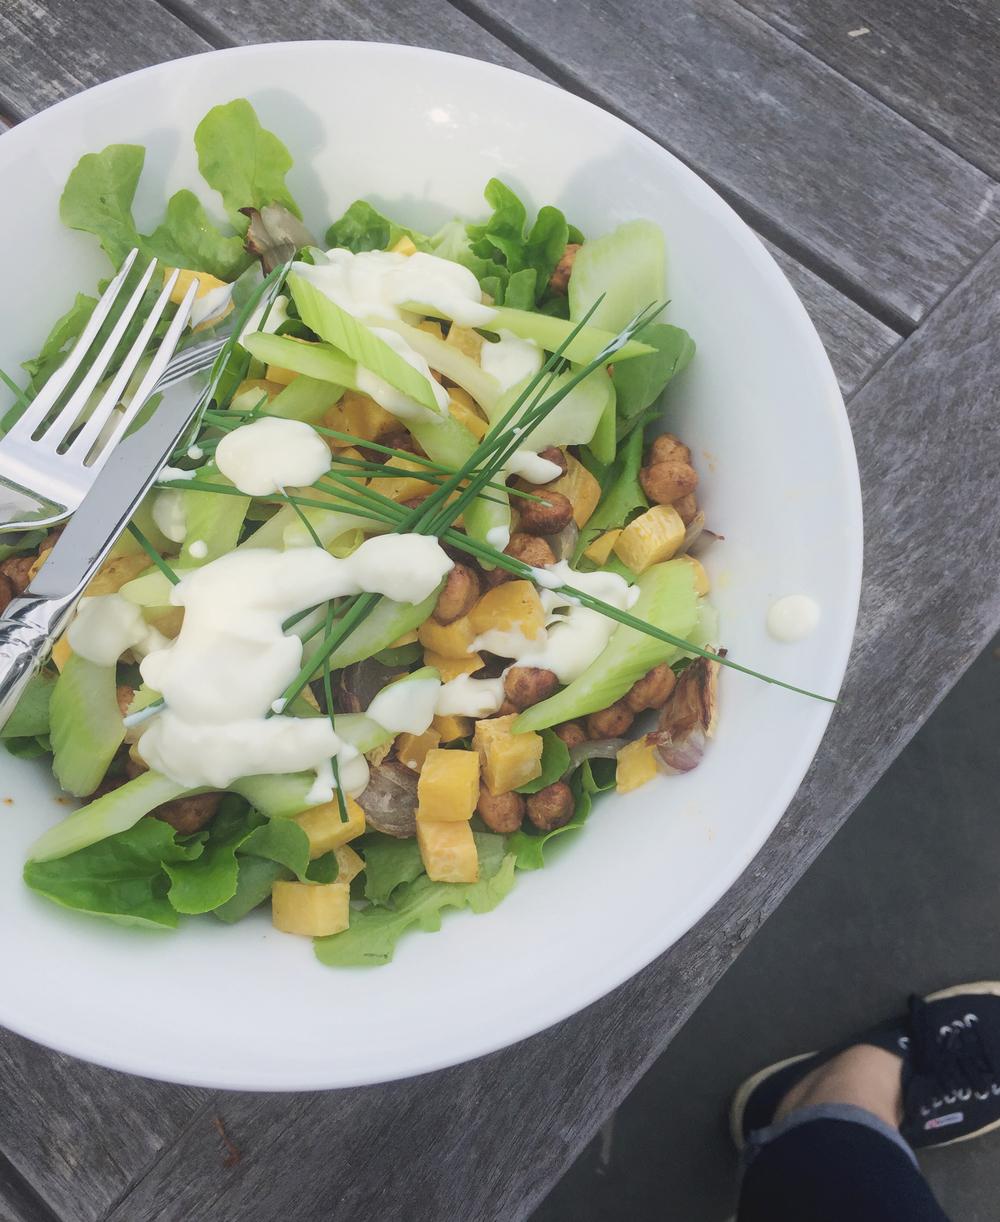 Summerfield Delight | Market Salad with Roasted Chickpeas